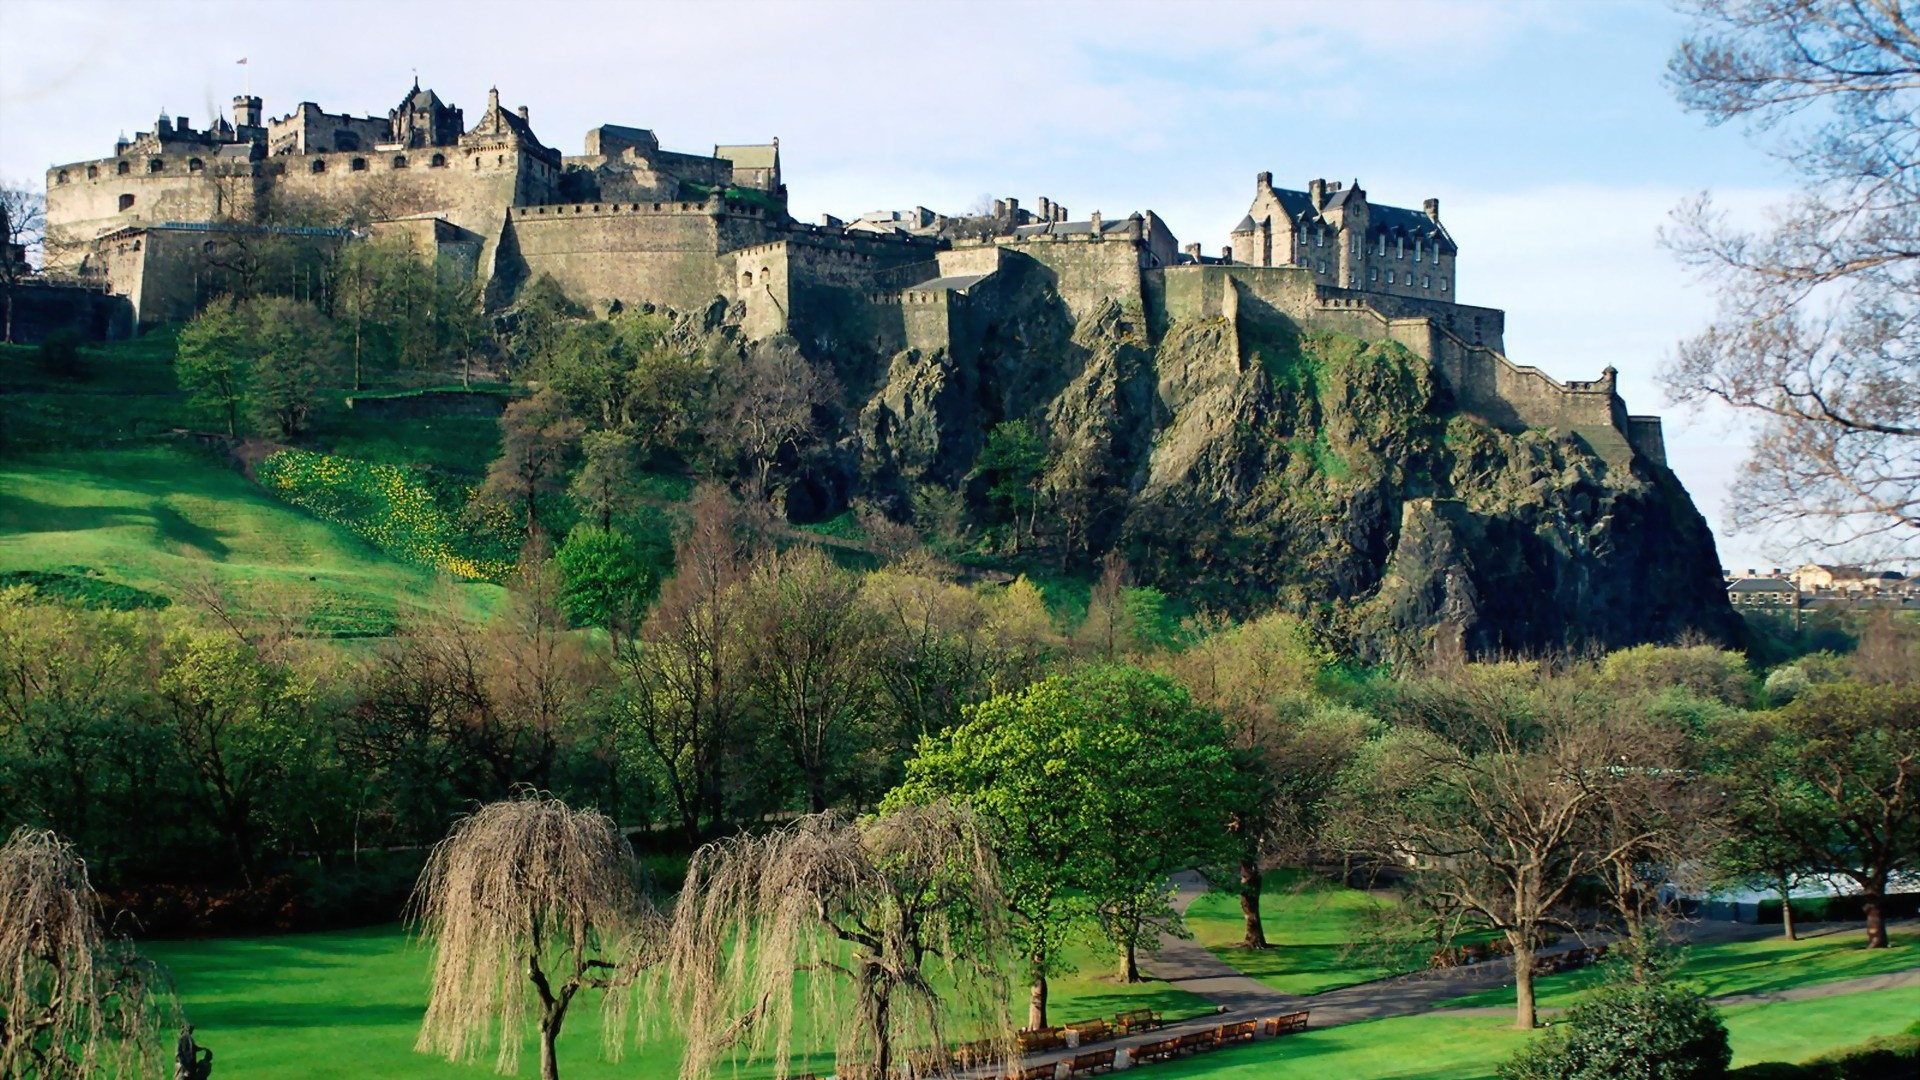 download wallpaper 1920x1080 scotland, castle, hills, grass, nature